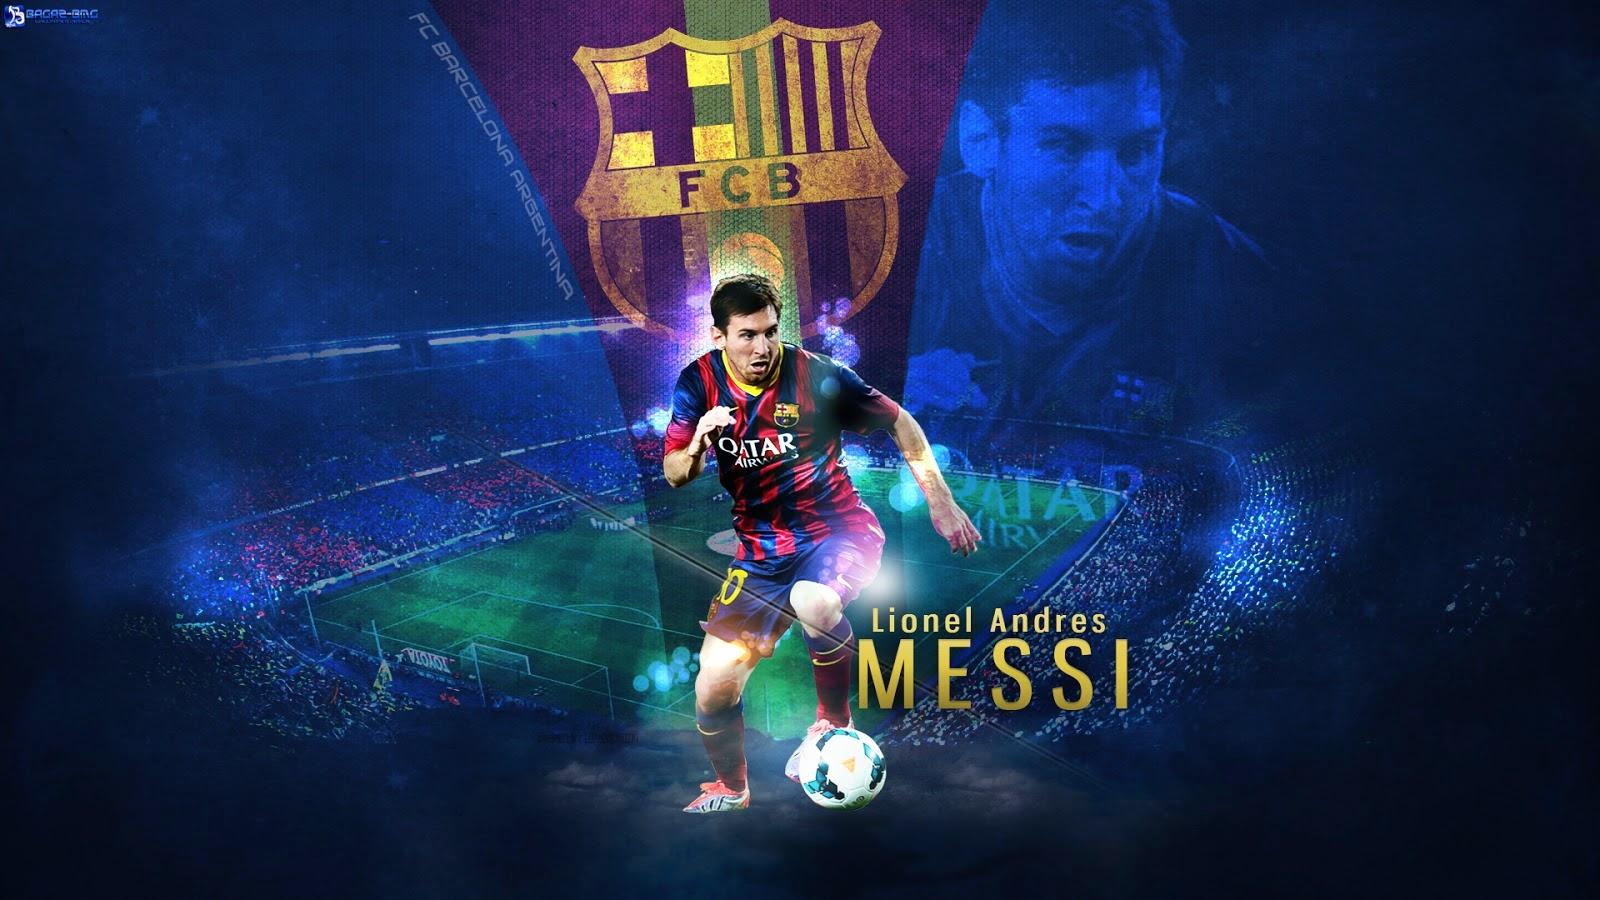 Wallpapers HD Corner Lionel Messi Fc Barcelona HD Wallpapers 2015 1600x900